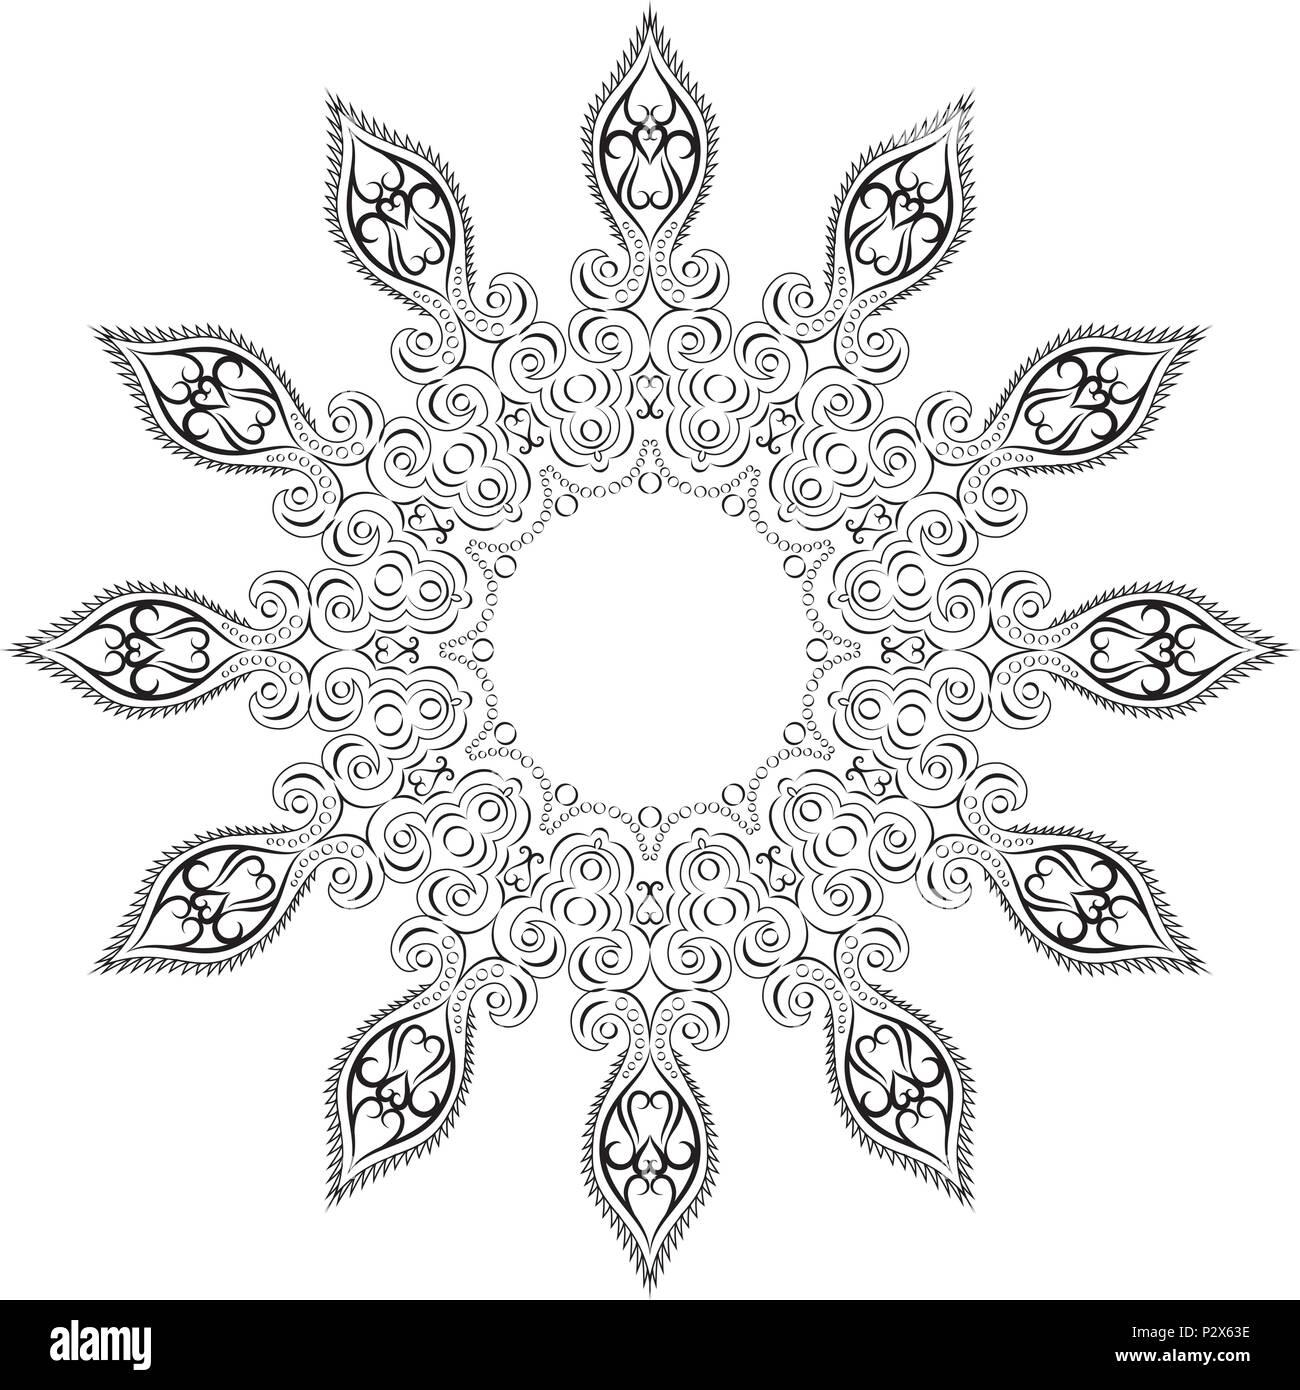 Mandala, tribal ethnic ornament, vector art - Stock Image